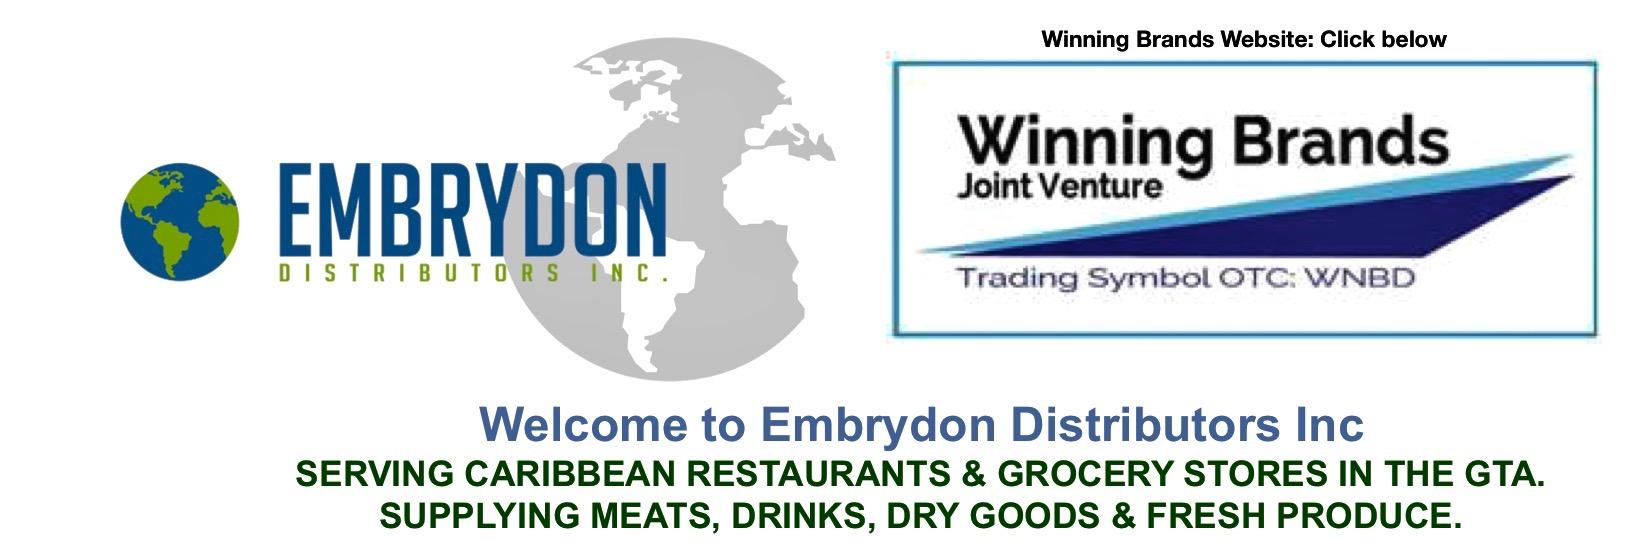 Louis Fruit Preserves - Embrydon Distributors Inc